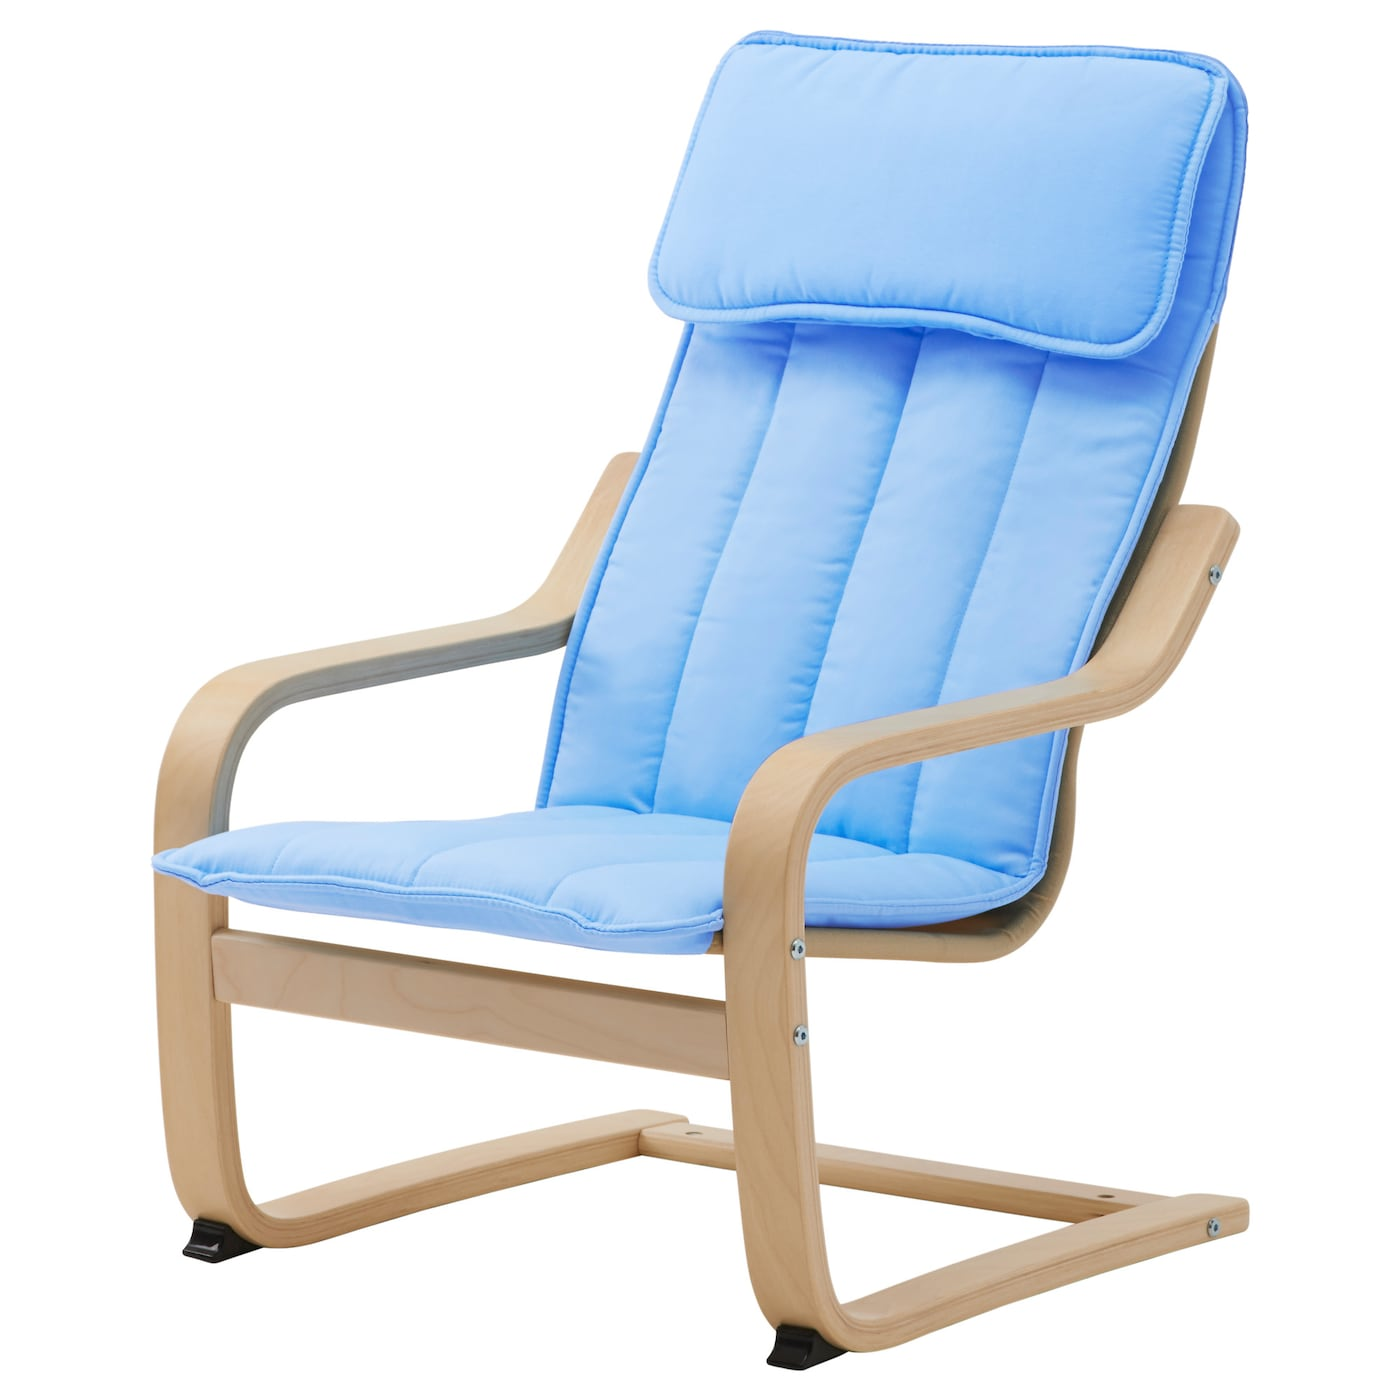 winkelinrichting winkelinterieur ikea. Black Bedroom Furniture Sets. Home Design Ideas